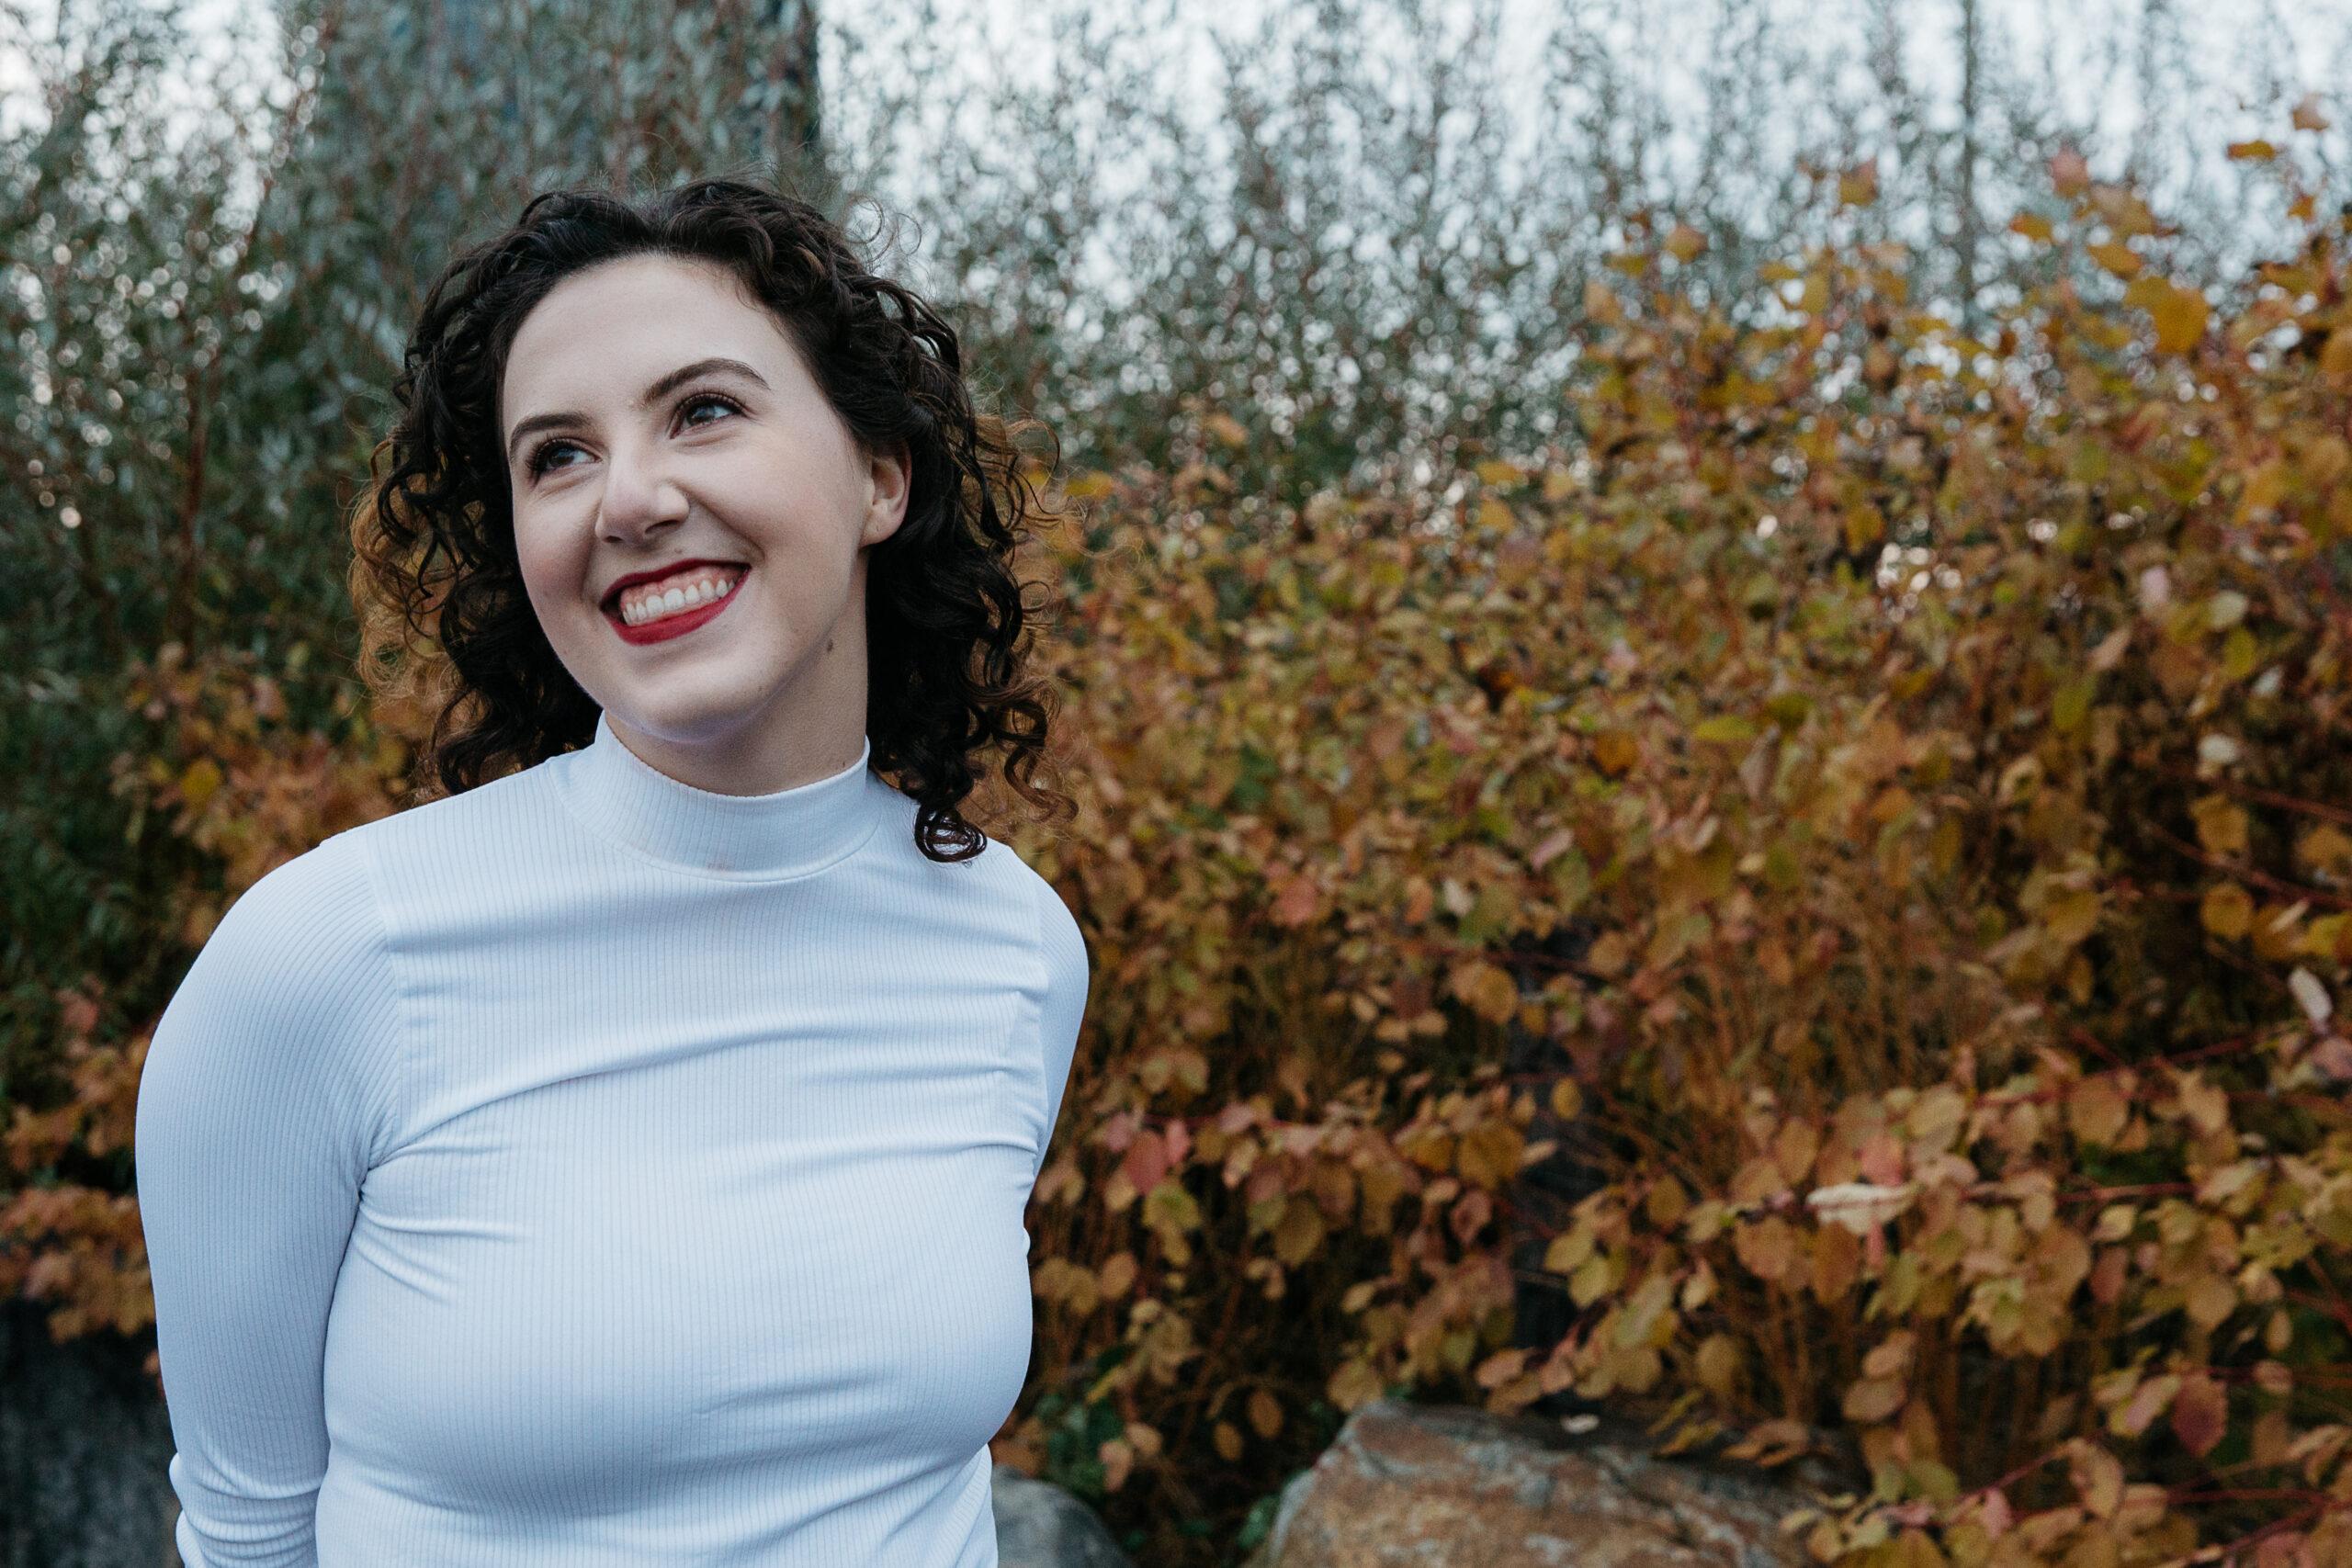 Ashley Nicole Martin